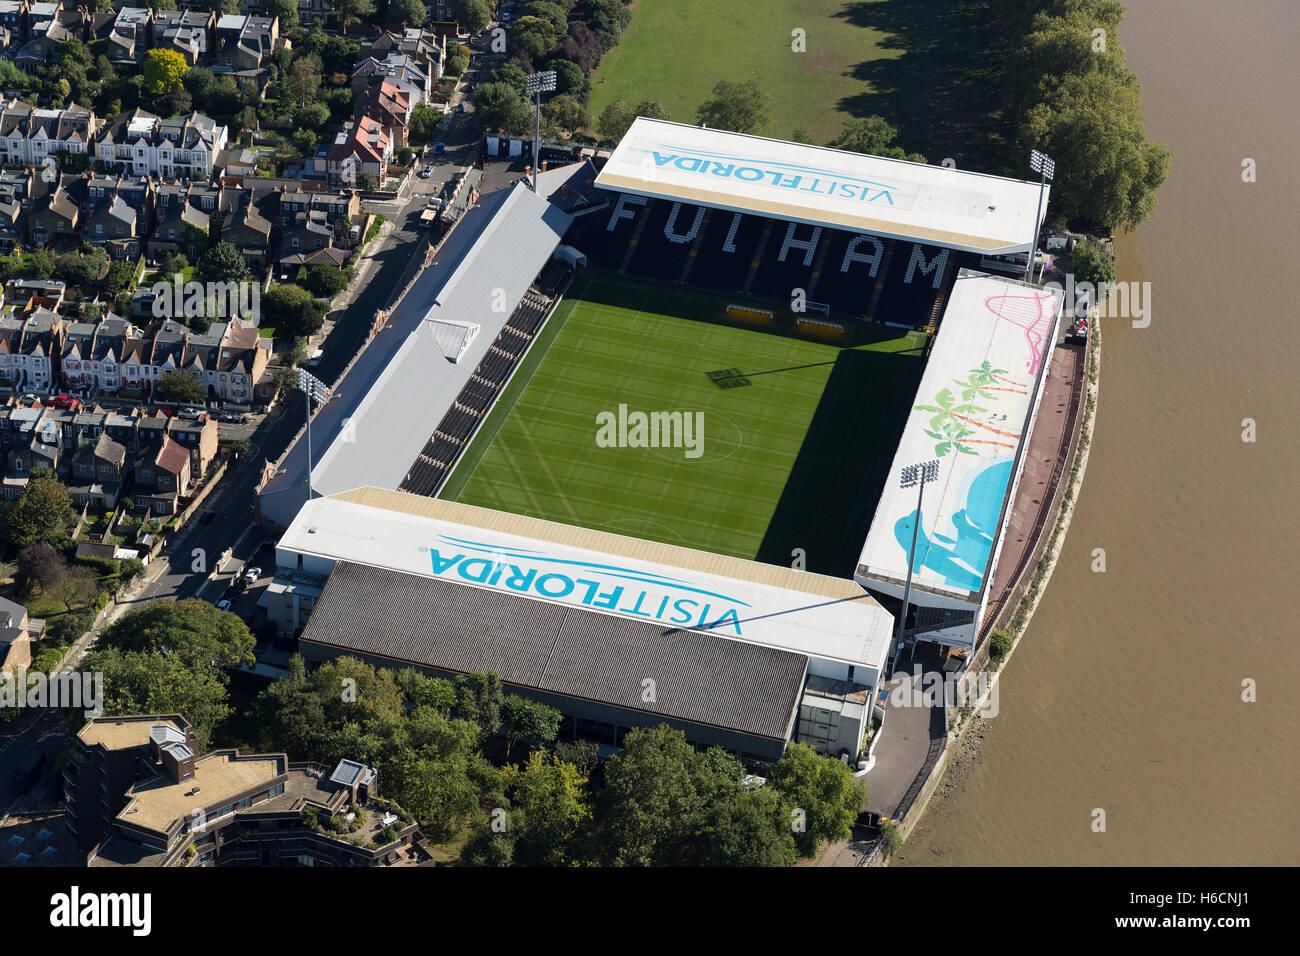 Craven Cottage, Fulham Football Club, Stevenage Rd, London SW6 6HH. - Stock Image